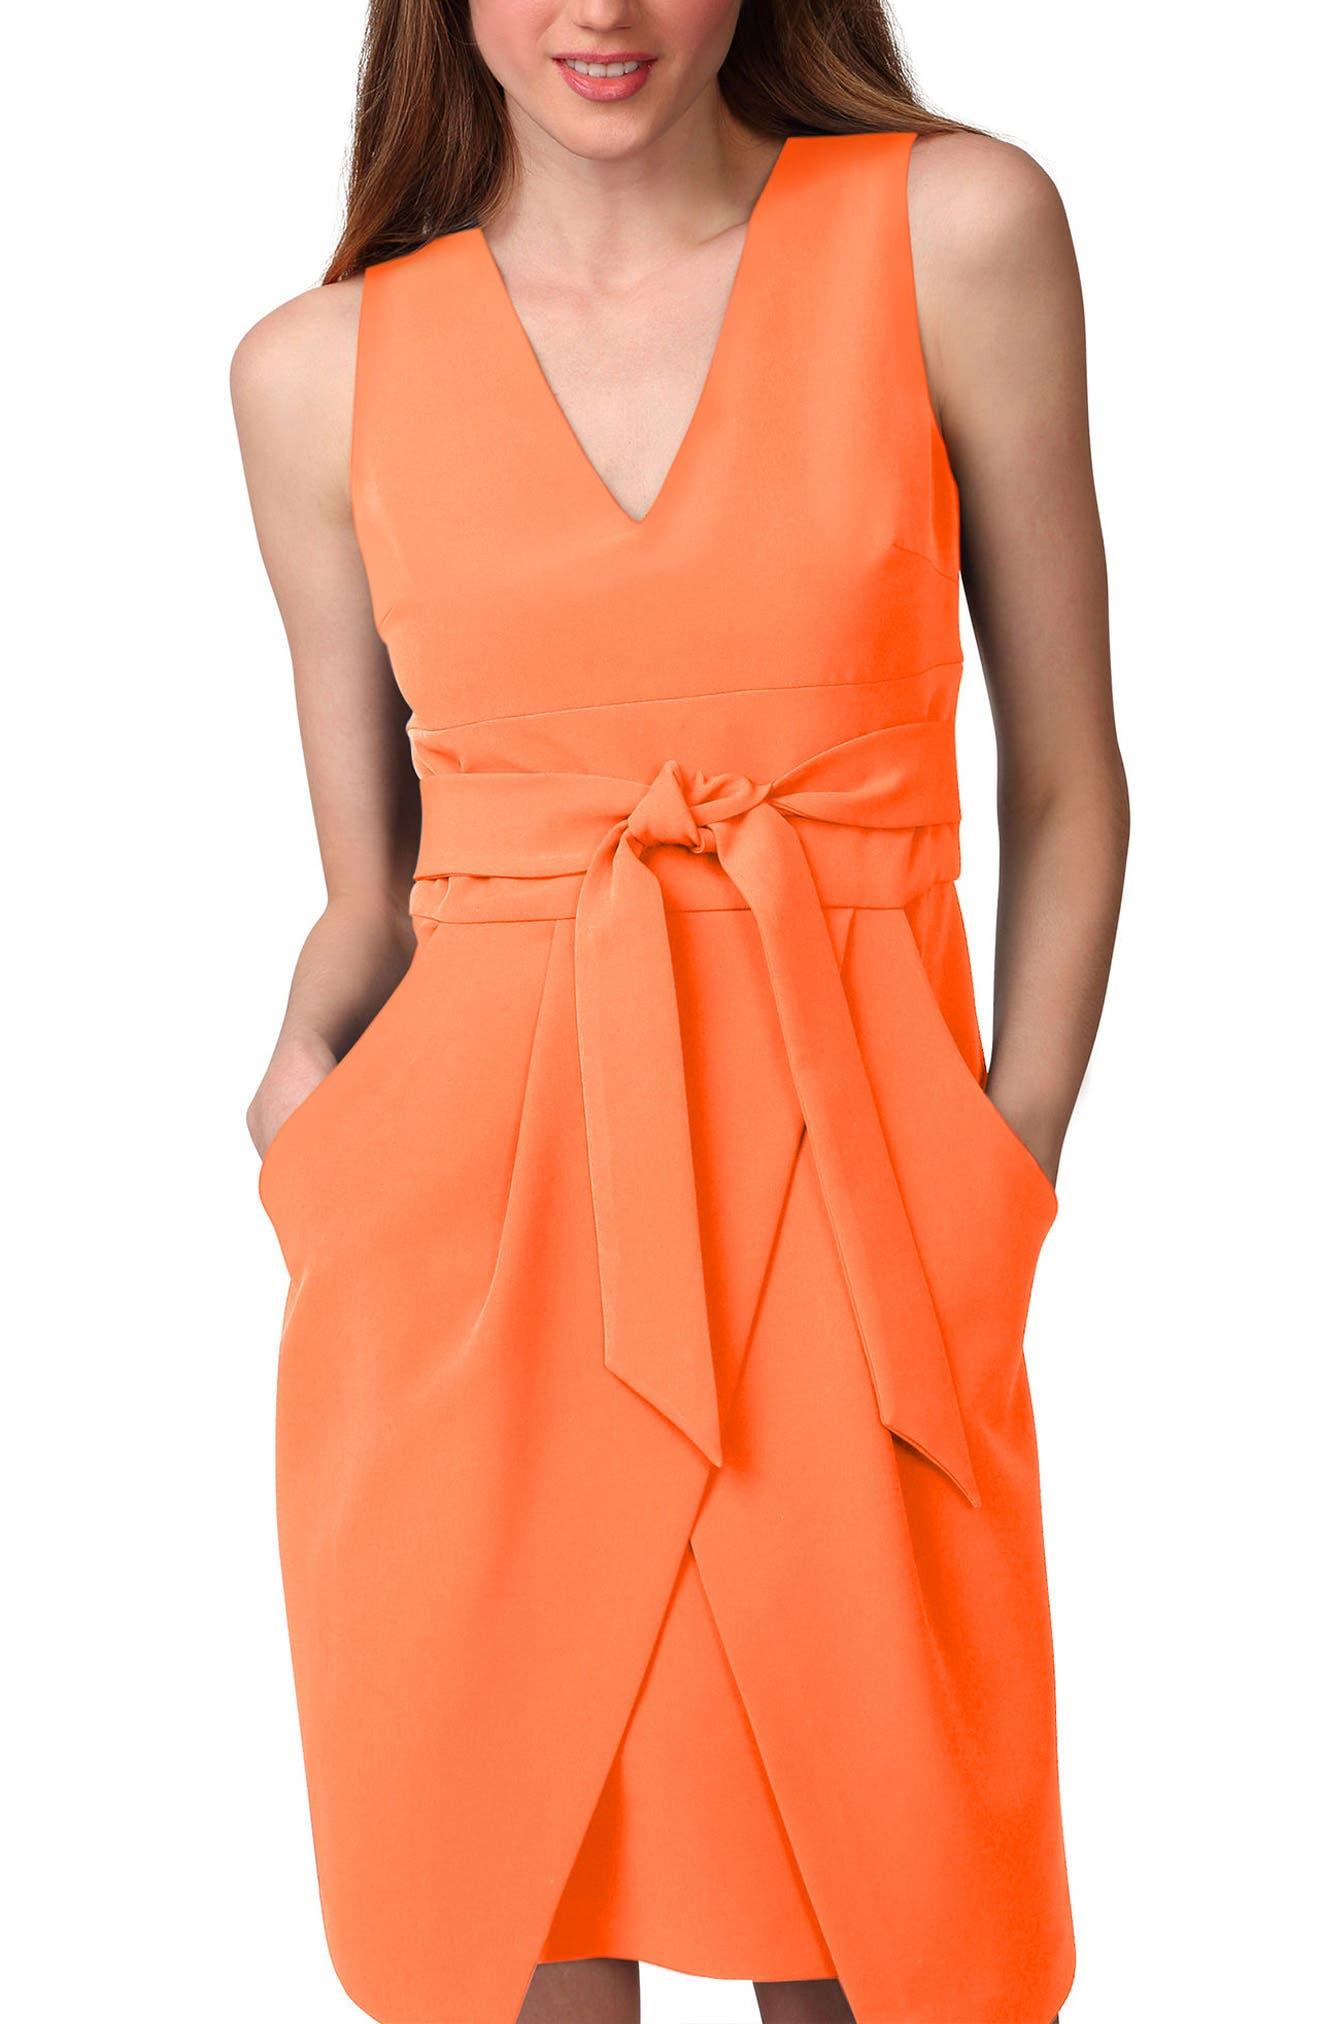 Alternate Image 1 Selected - Donna Morgan Tulip Hem Sleeveless Crepe Dress (Regular & Petite)